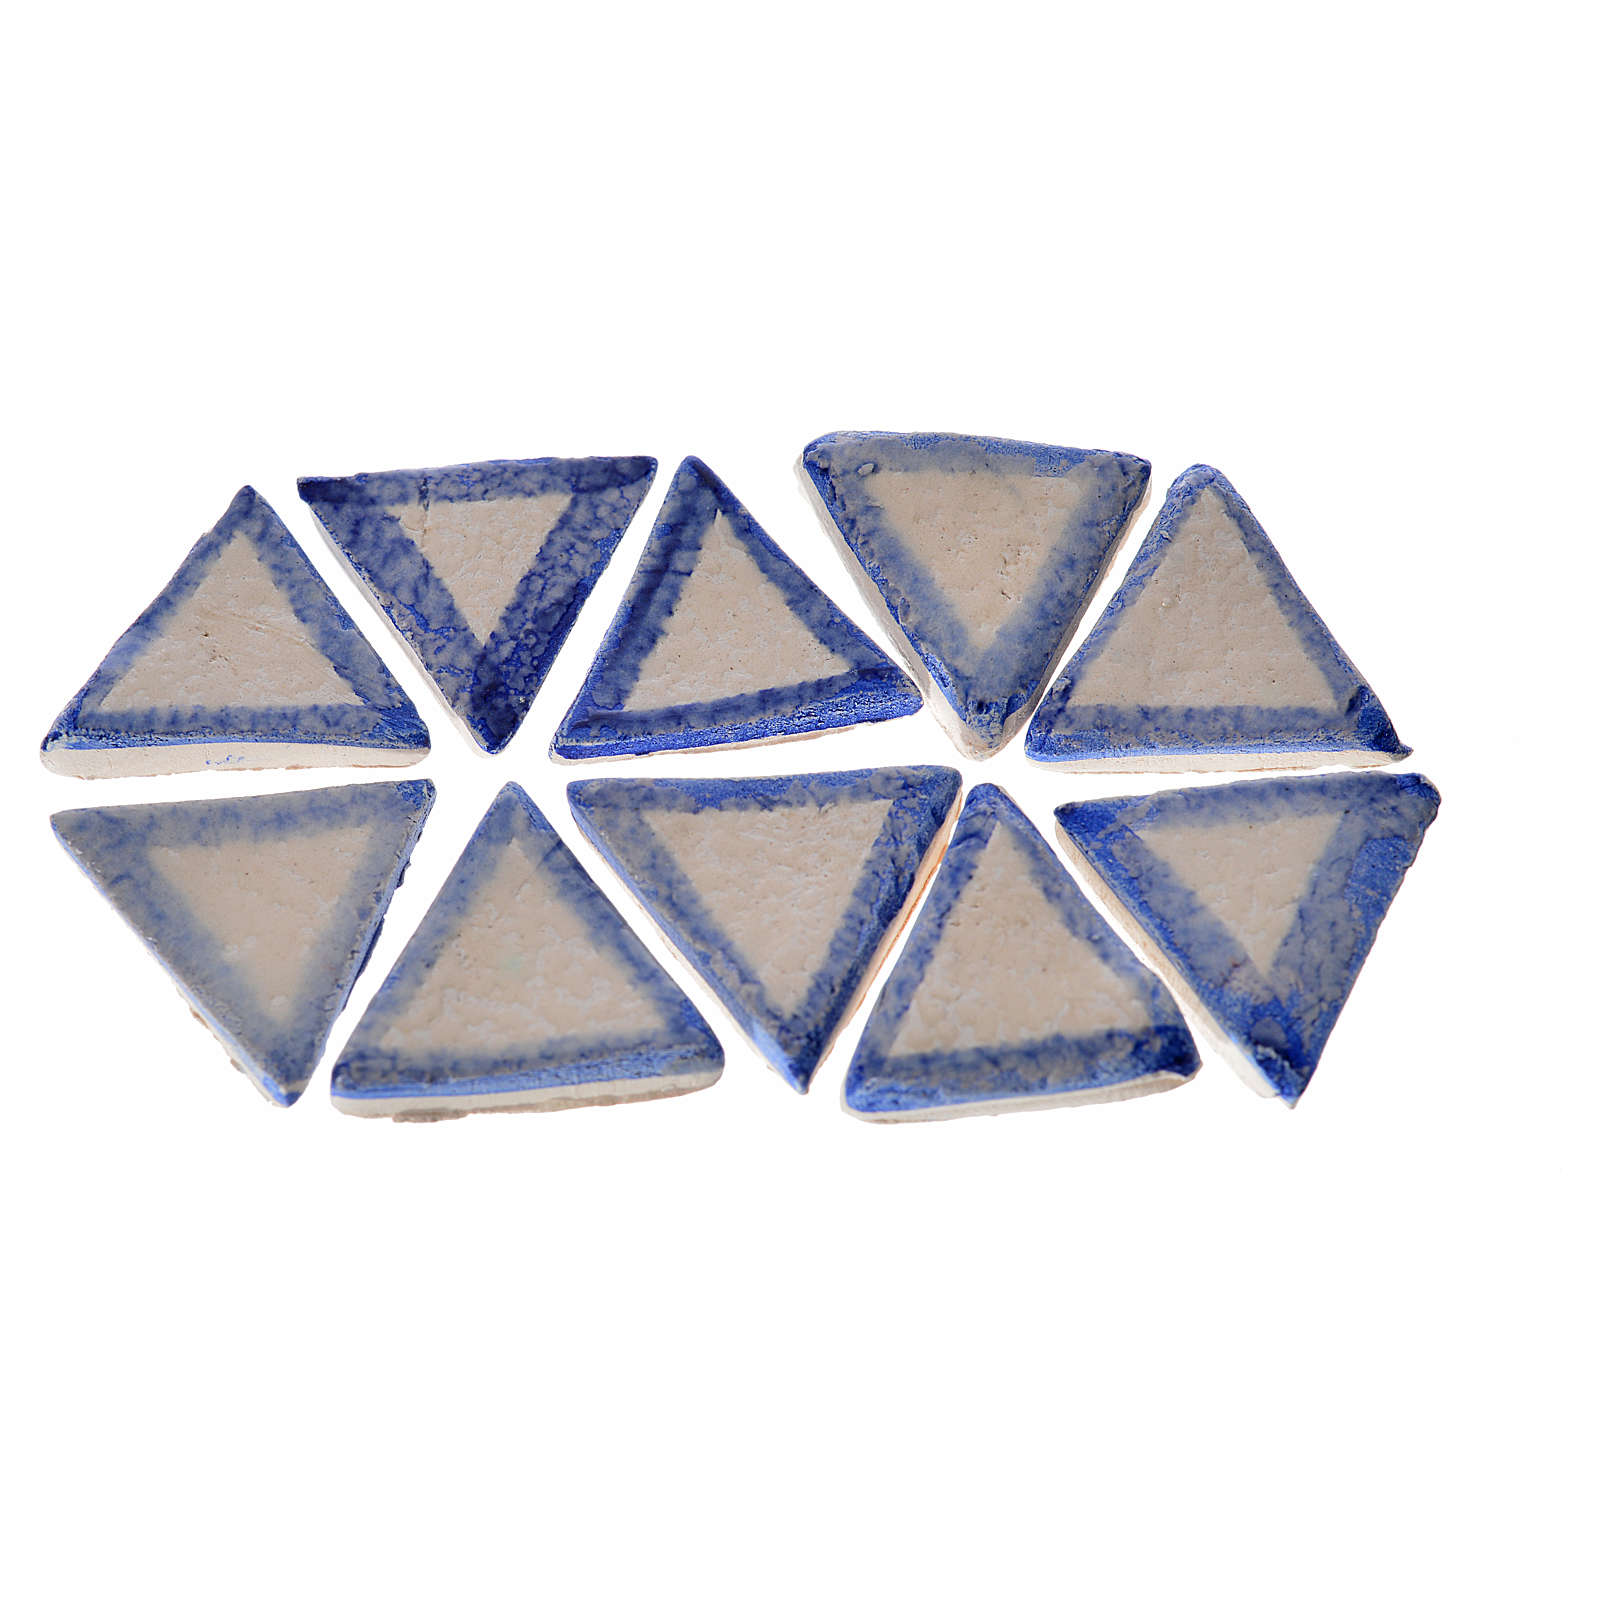 Mattonelle terracotta smaltate 60 pz triangolari linea blu per p 4